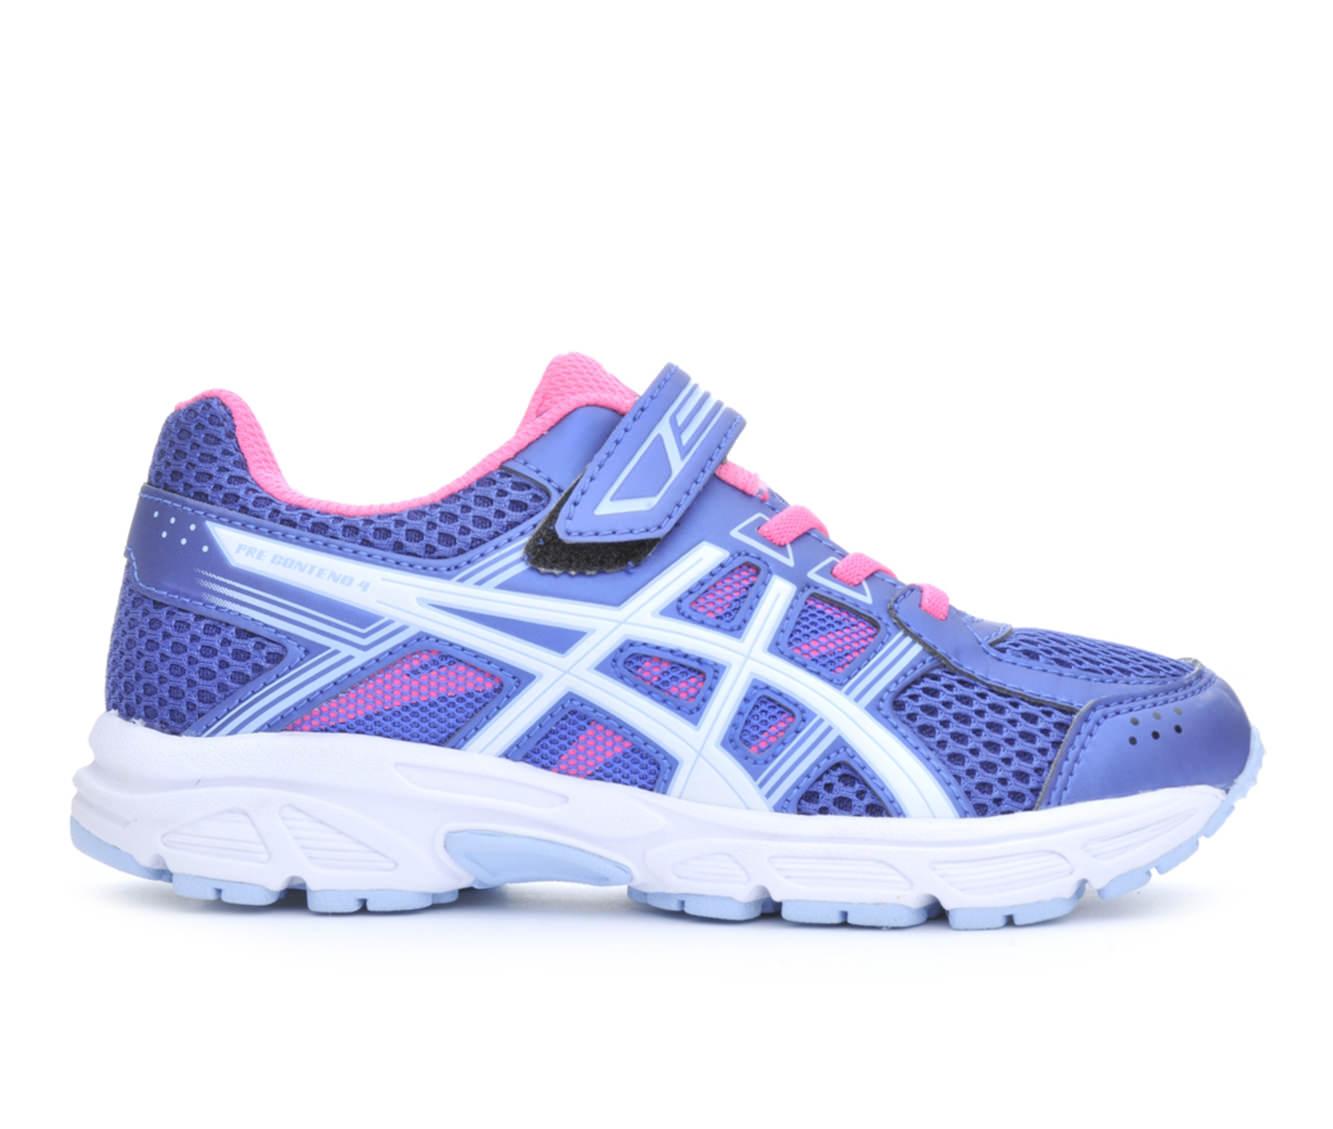 Girls' ASICS Pre Contend 4 Running Shoes (Blue)